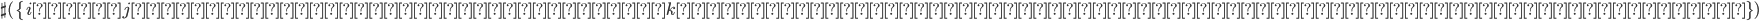 \sharp(\{iからj番目までのブロックのうちk番目のブロックが初めに取り出される取り出し方全体\})